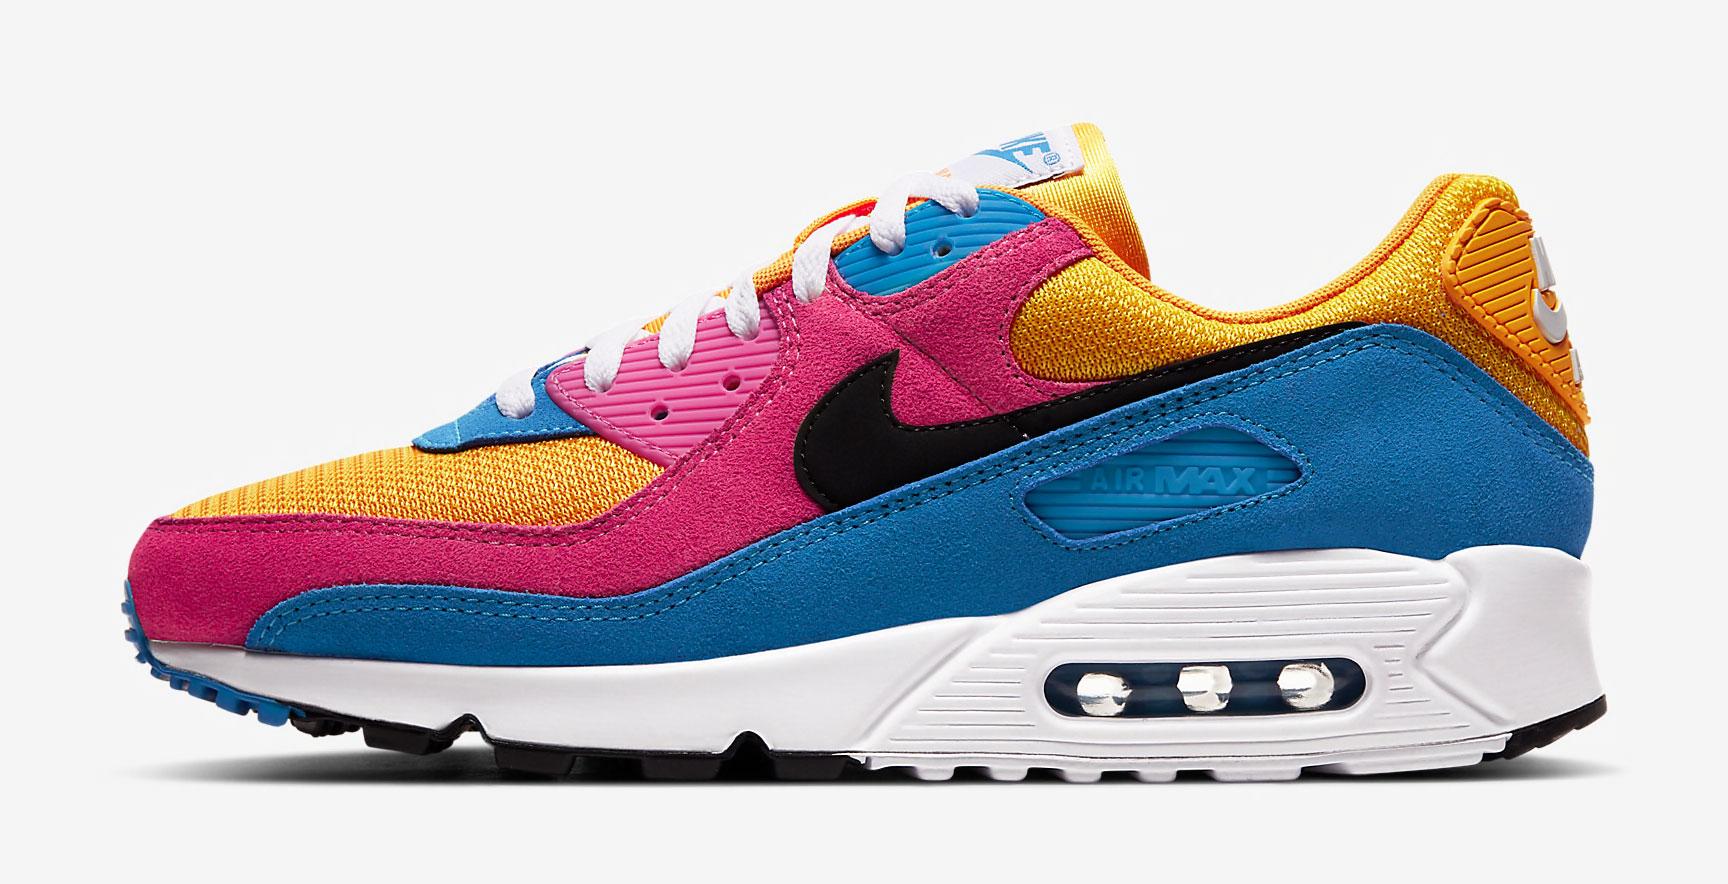 nike-air-max-90-yellow-pink-blue